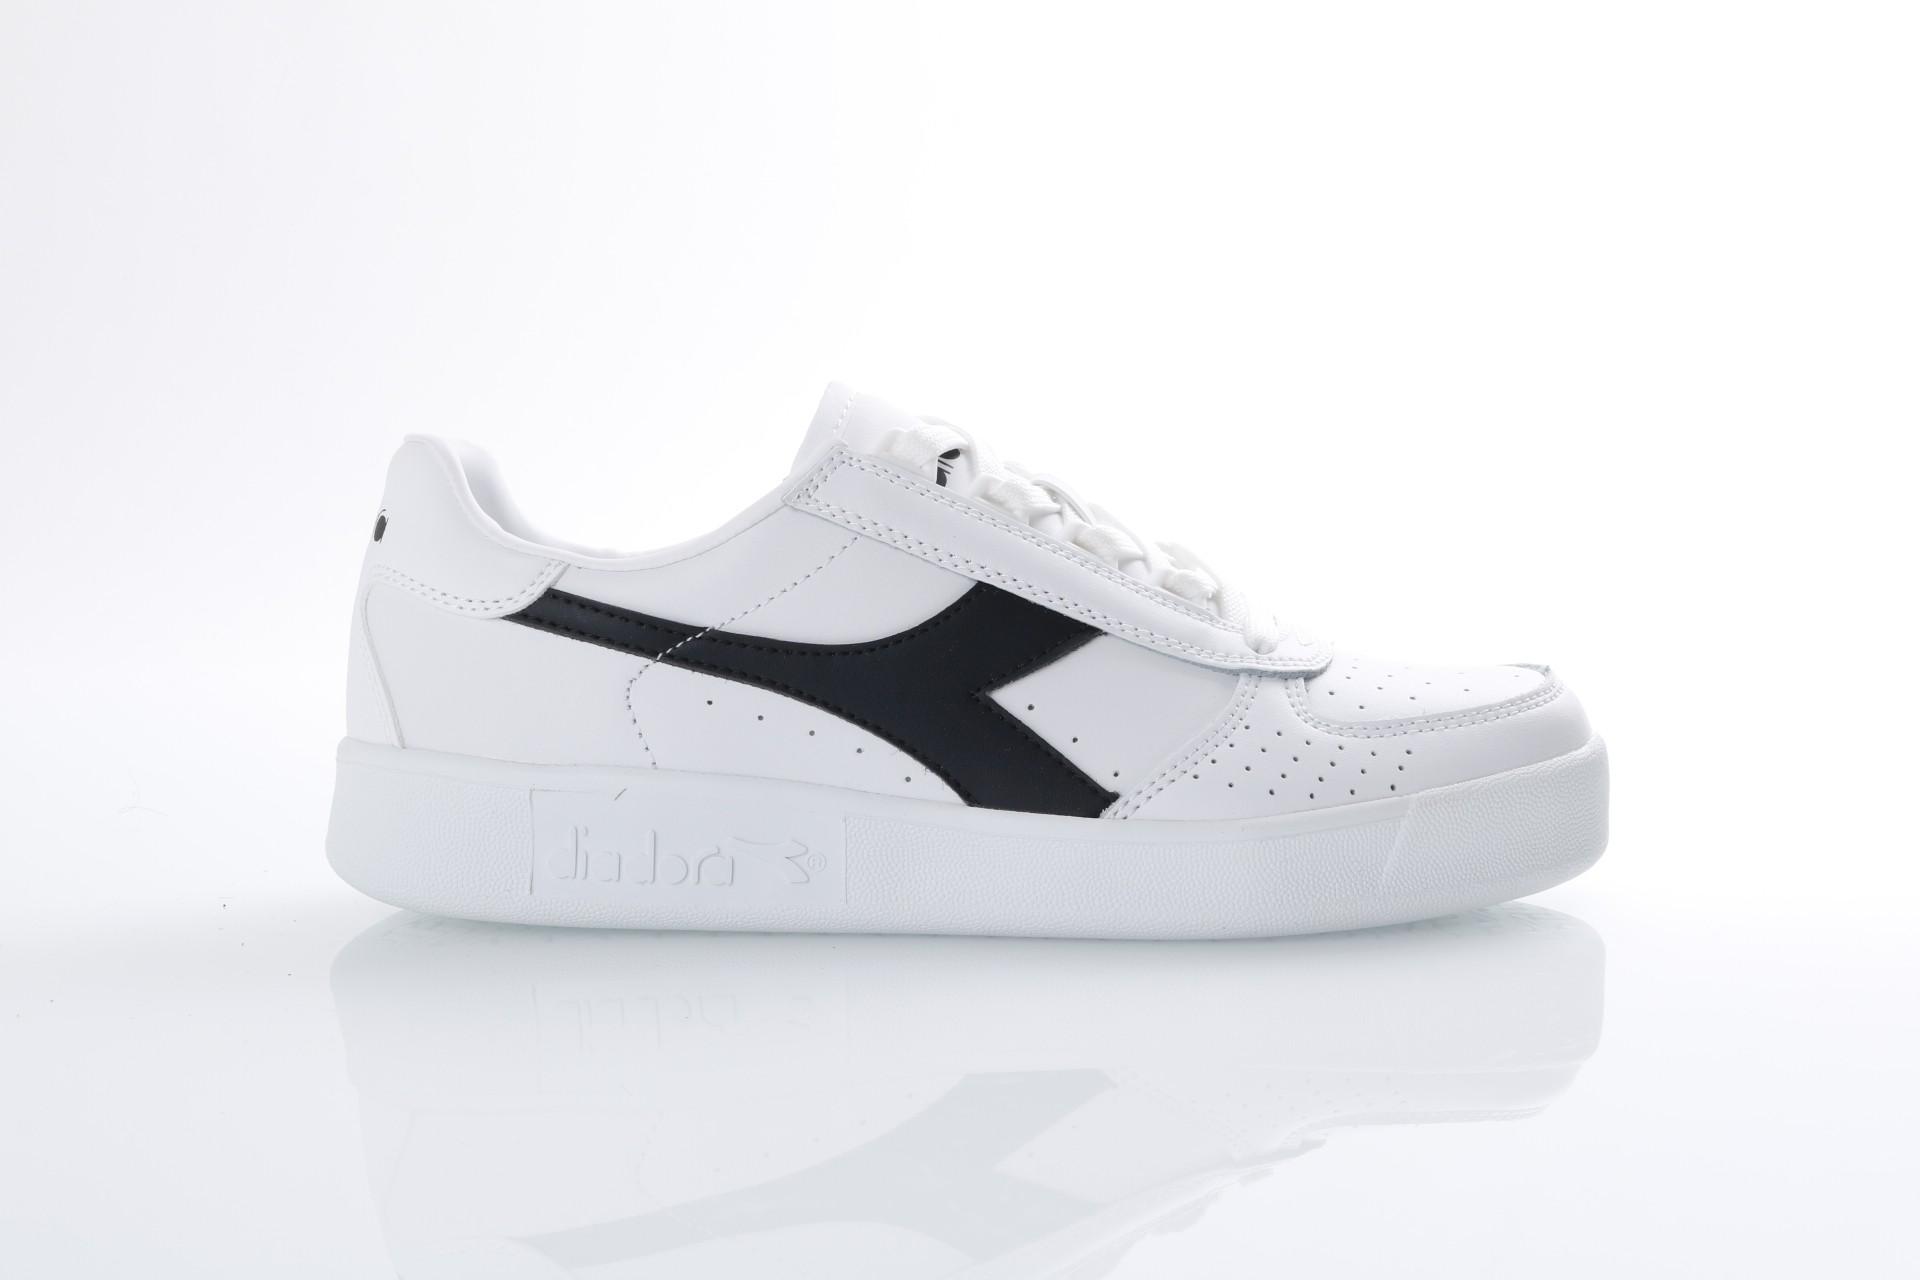 Foto van Diadora 501.170.595-C1880 Sneakers B elite Wit